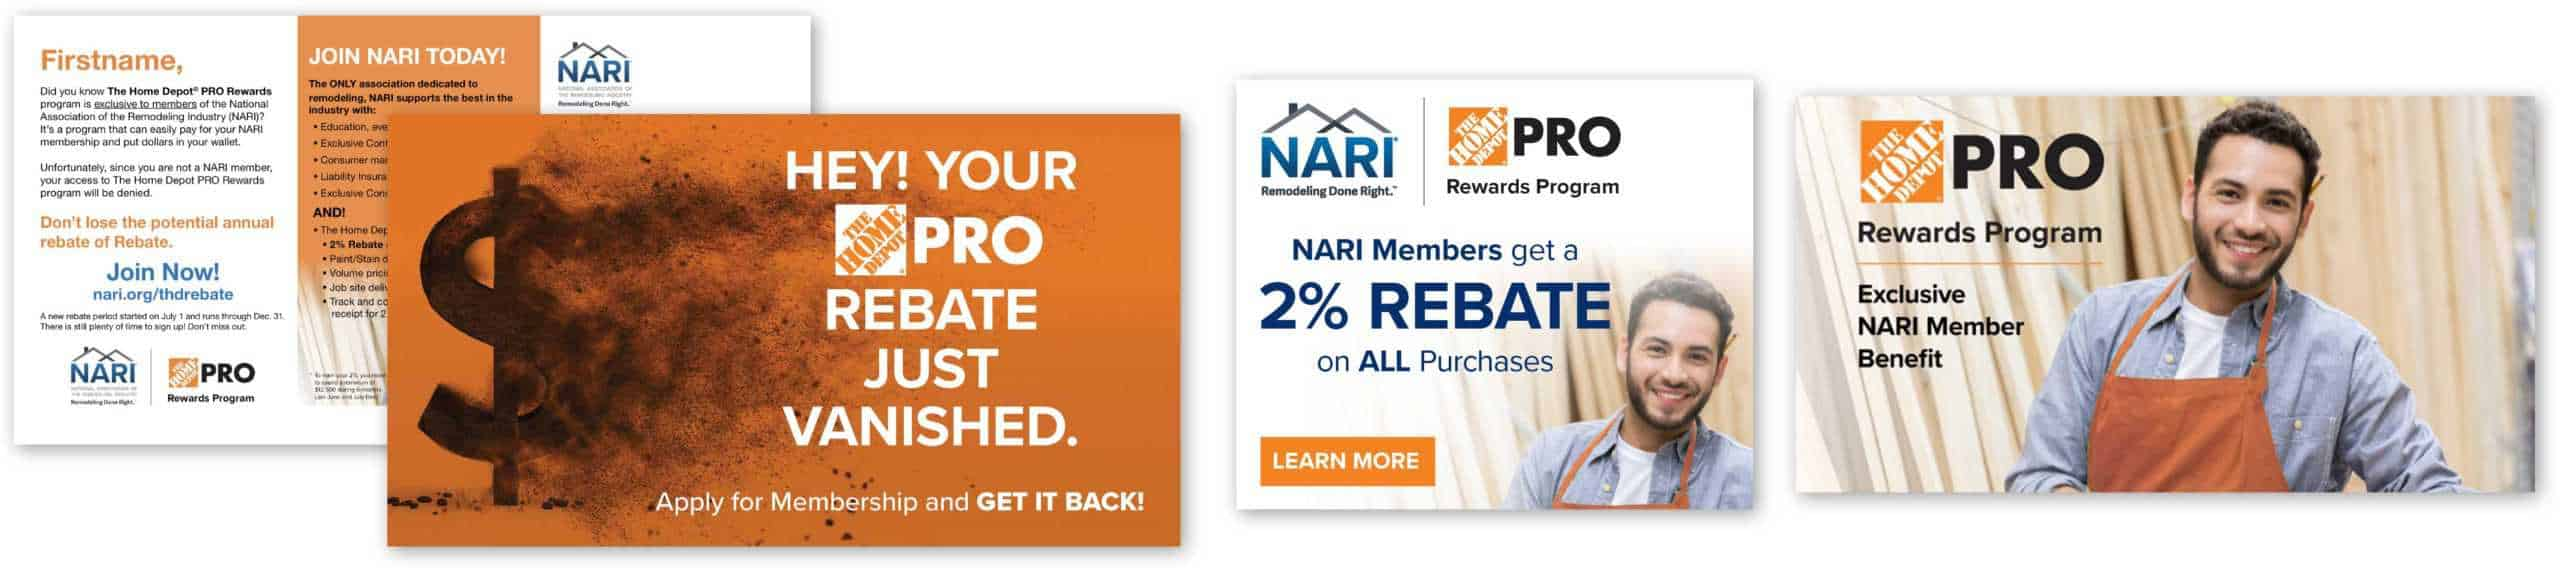 NARI HomeDepot Campaign